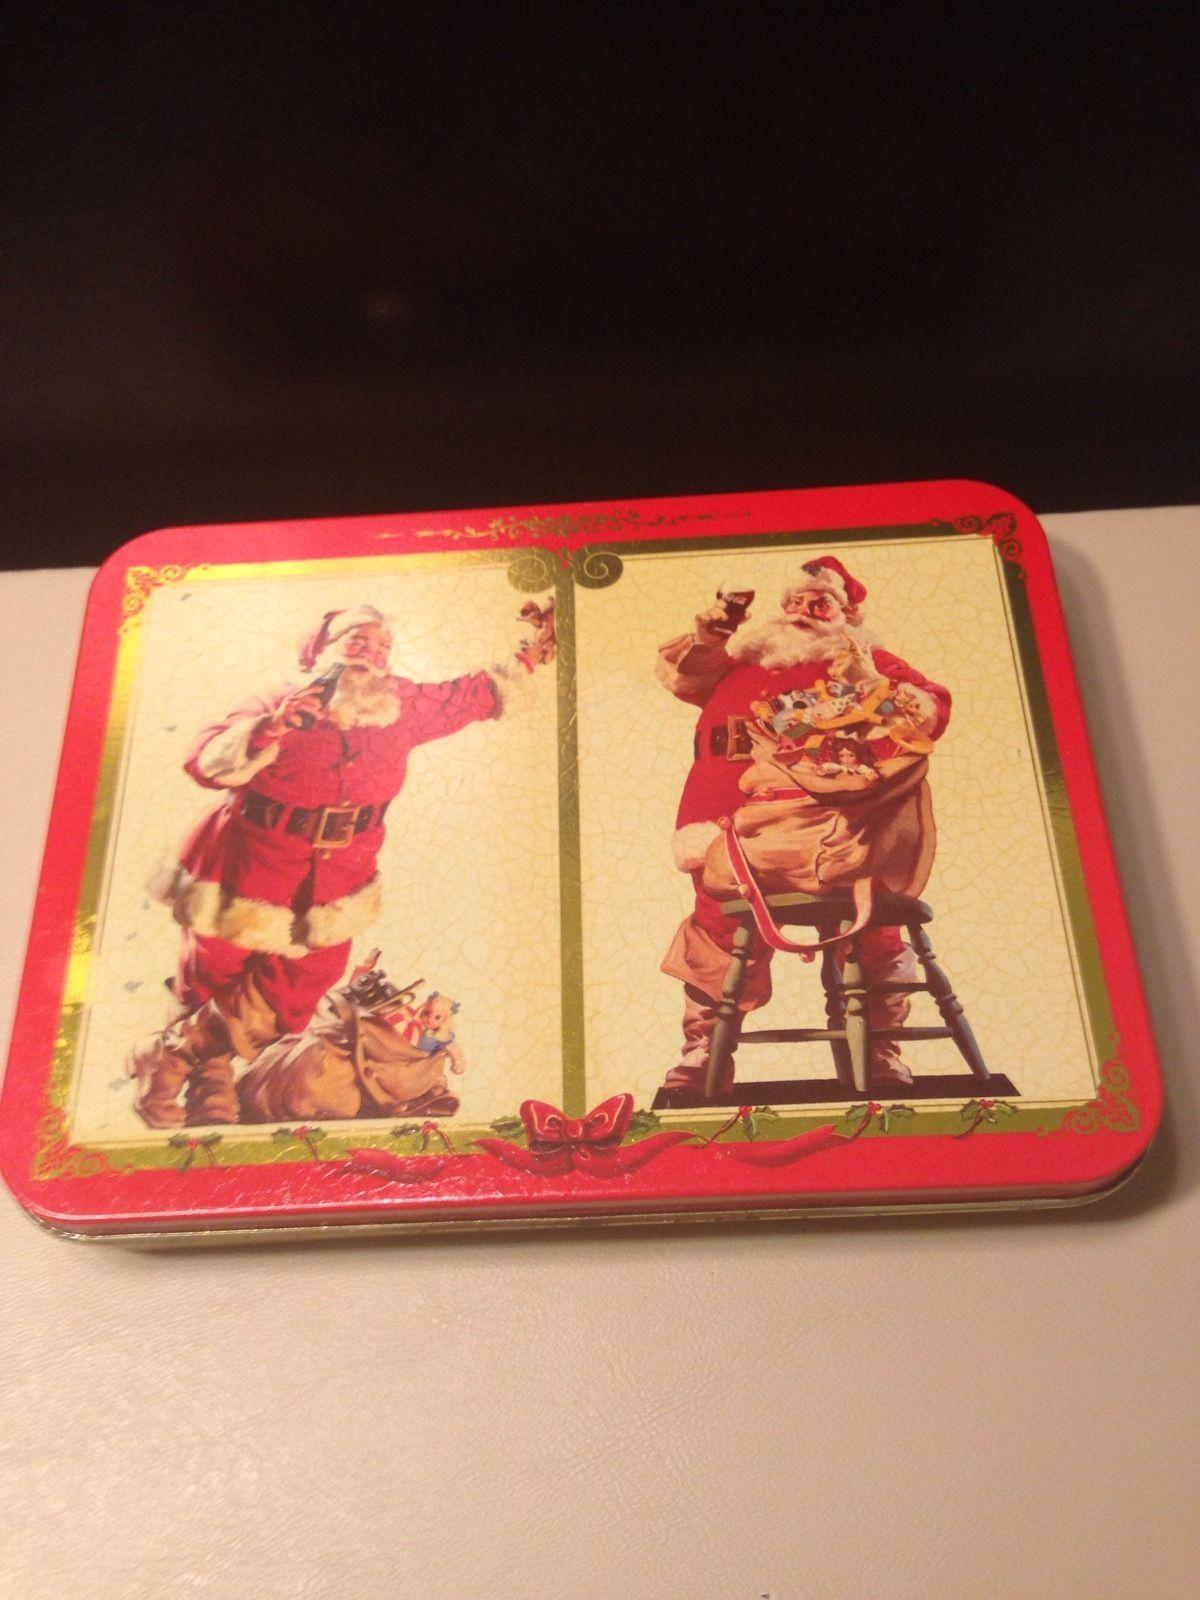 Vintage Coca Cola 1994 Limited Tin Christmas Holiday Santa Playing Cards Bicycle